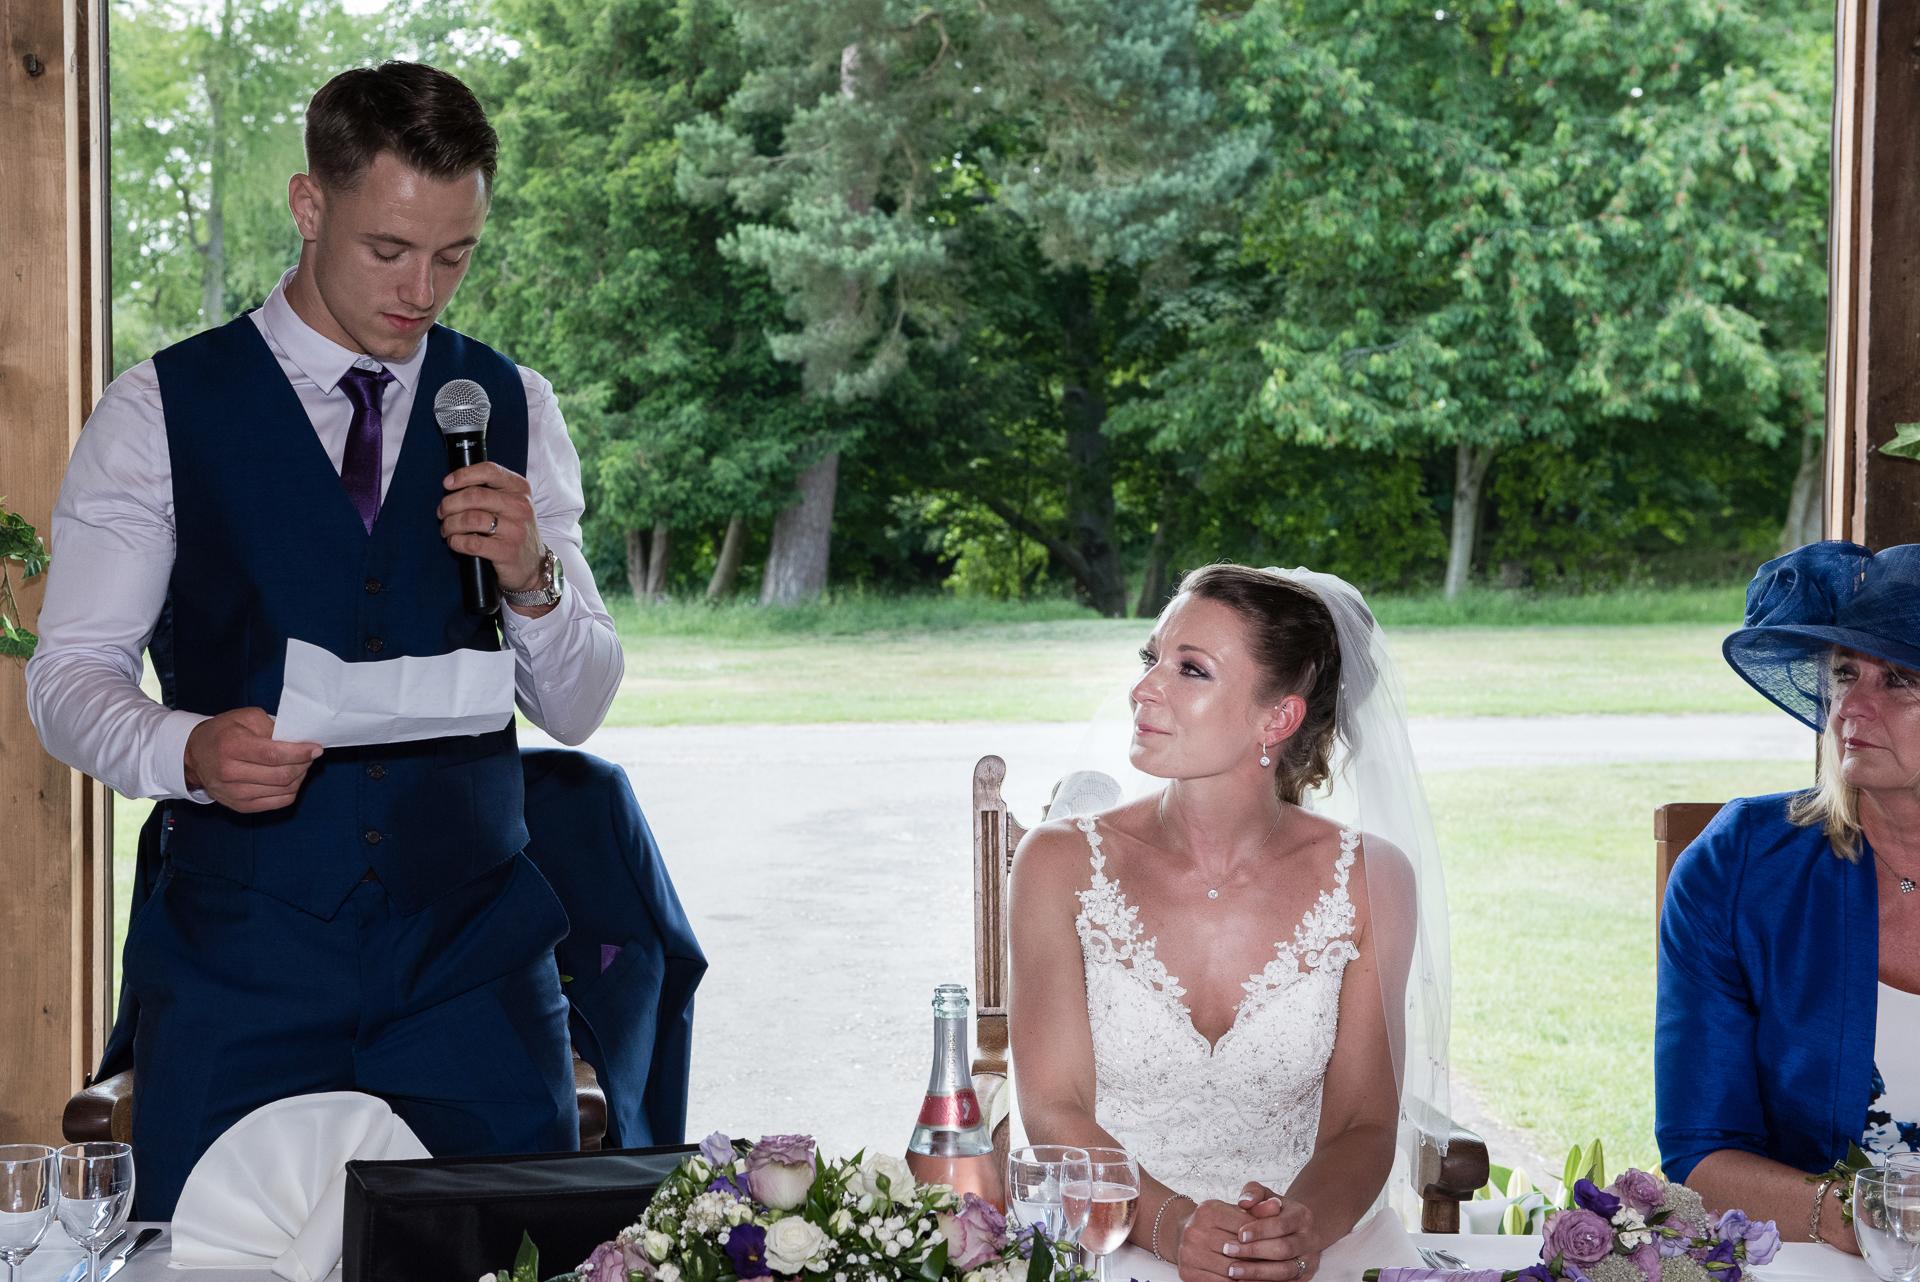 Ufton Court Wedding Photography32.JPG